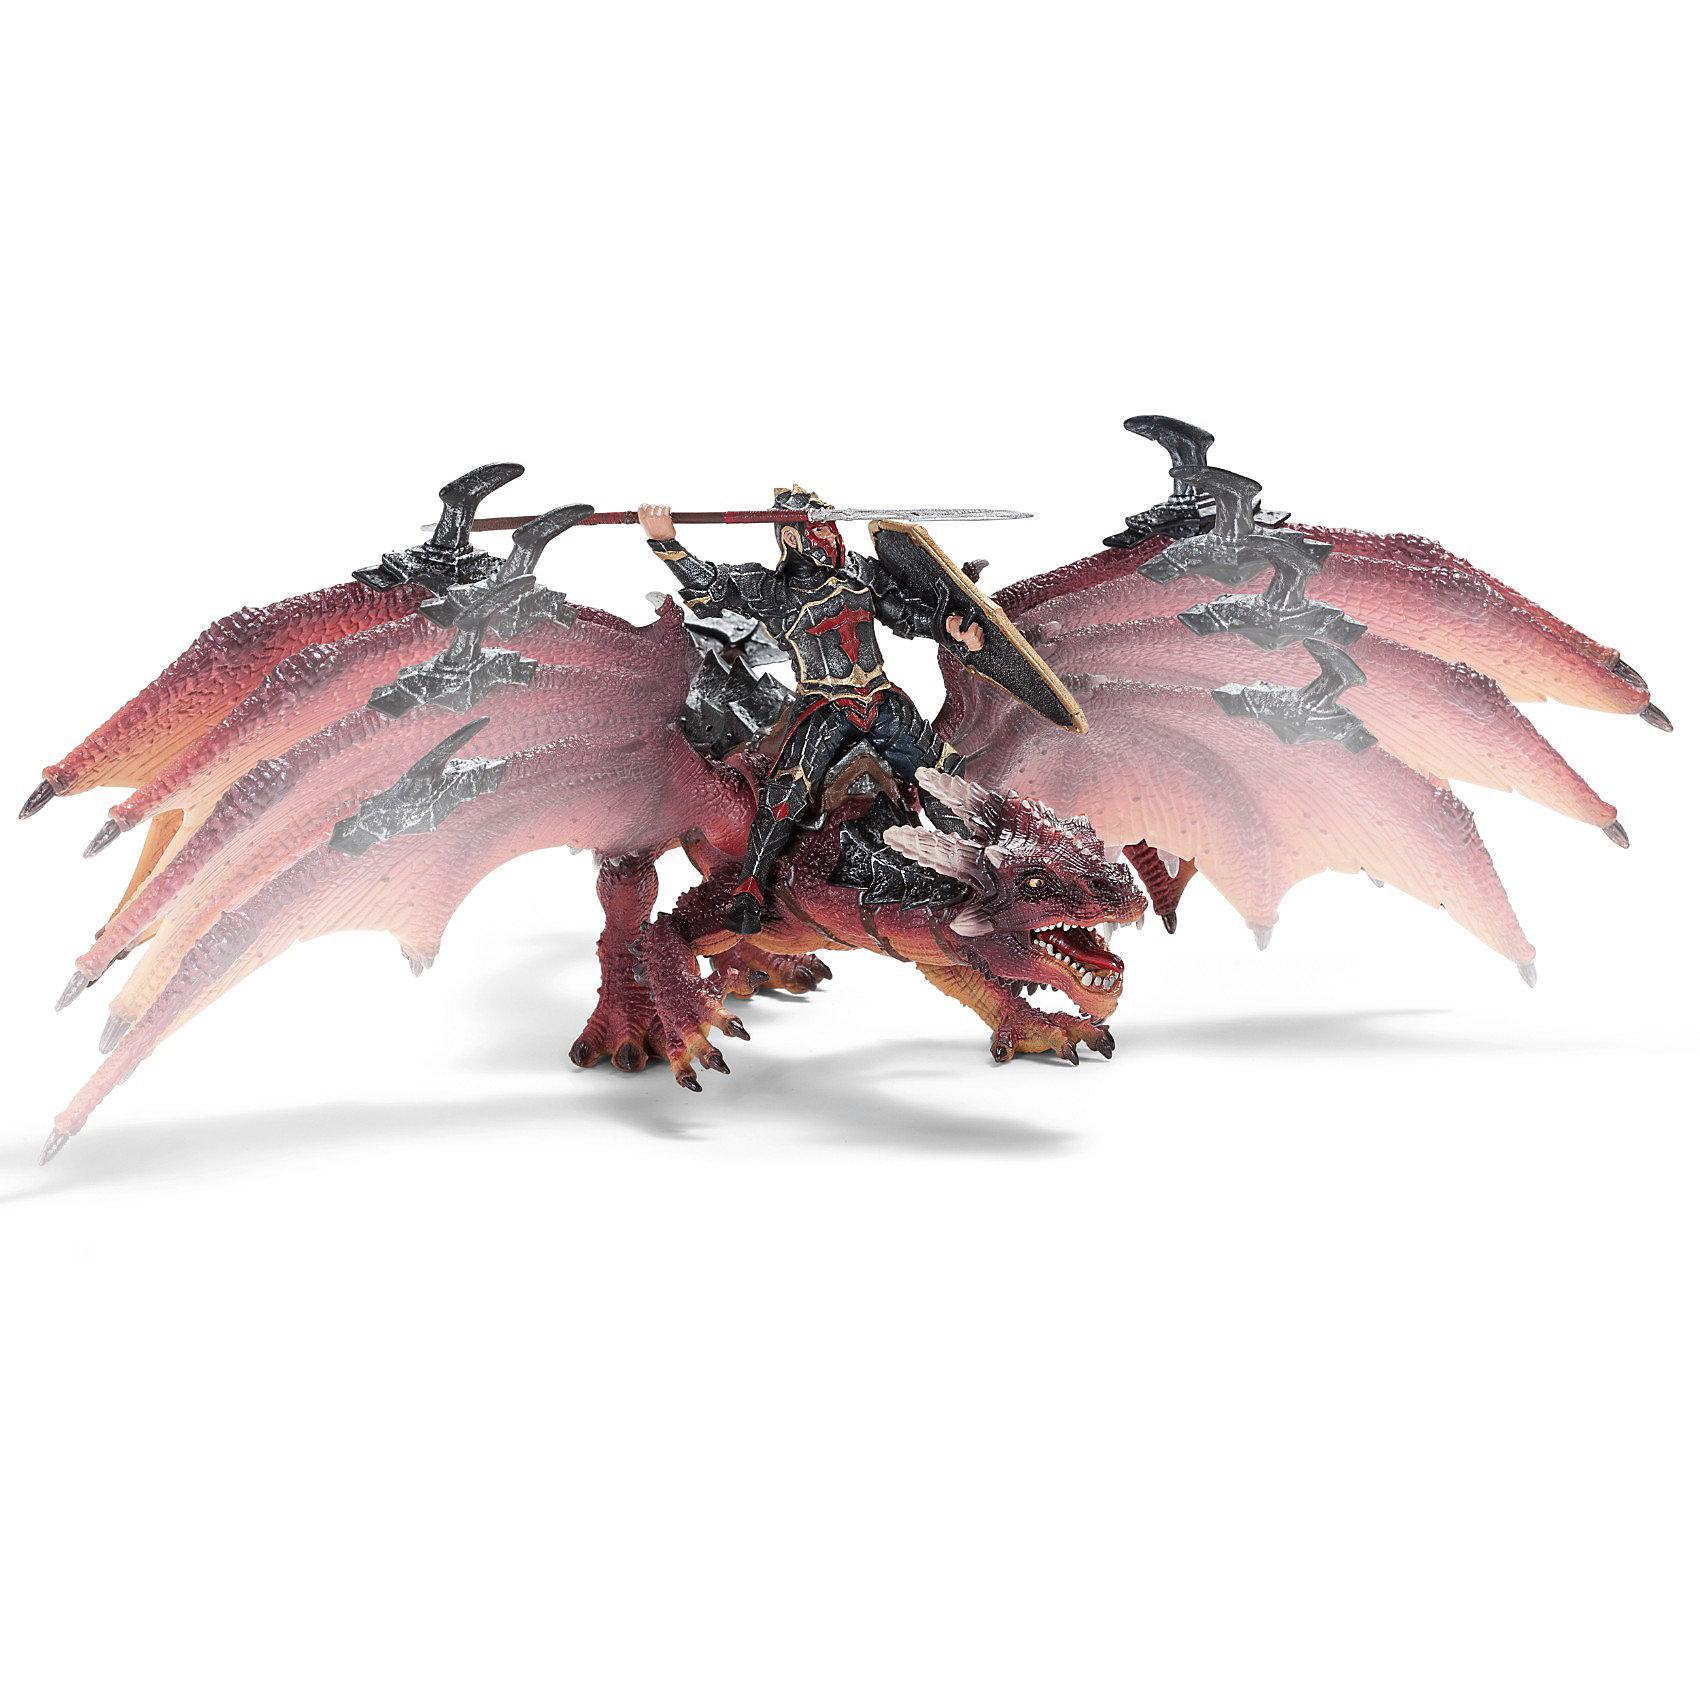 Schleich Всадник на драконе Орден Дракона, Schleich schleich всадник скорпиона